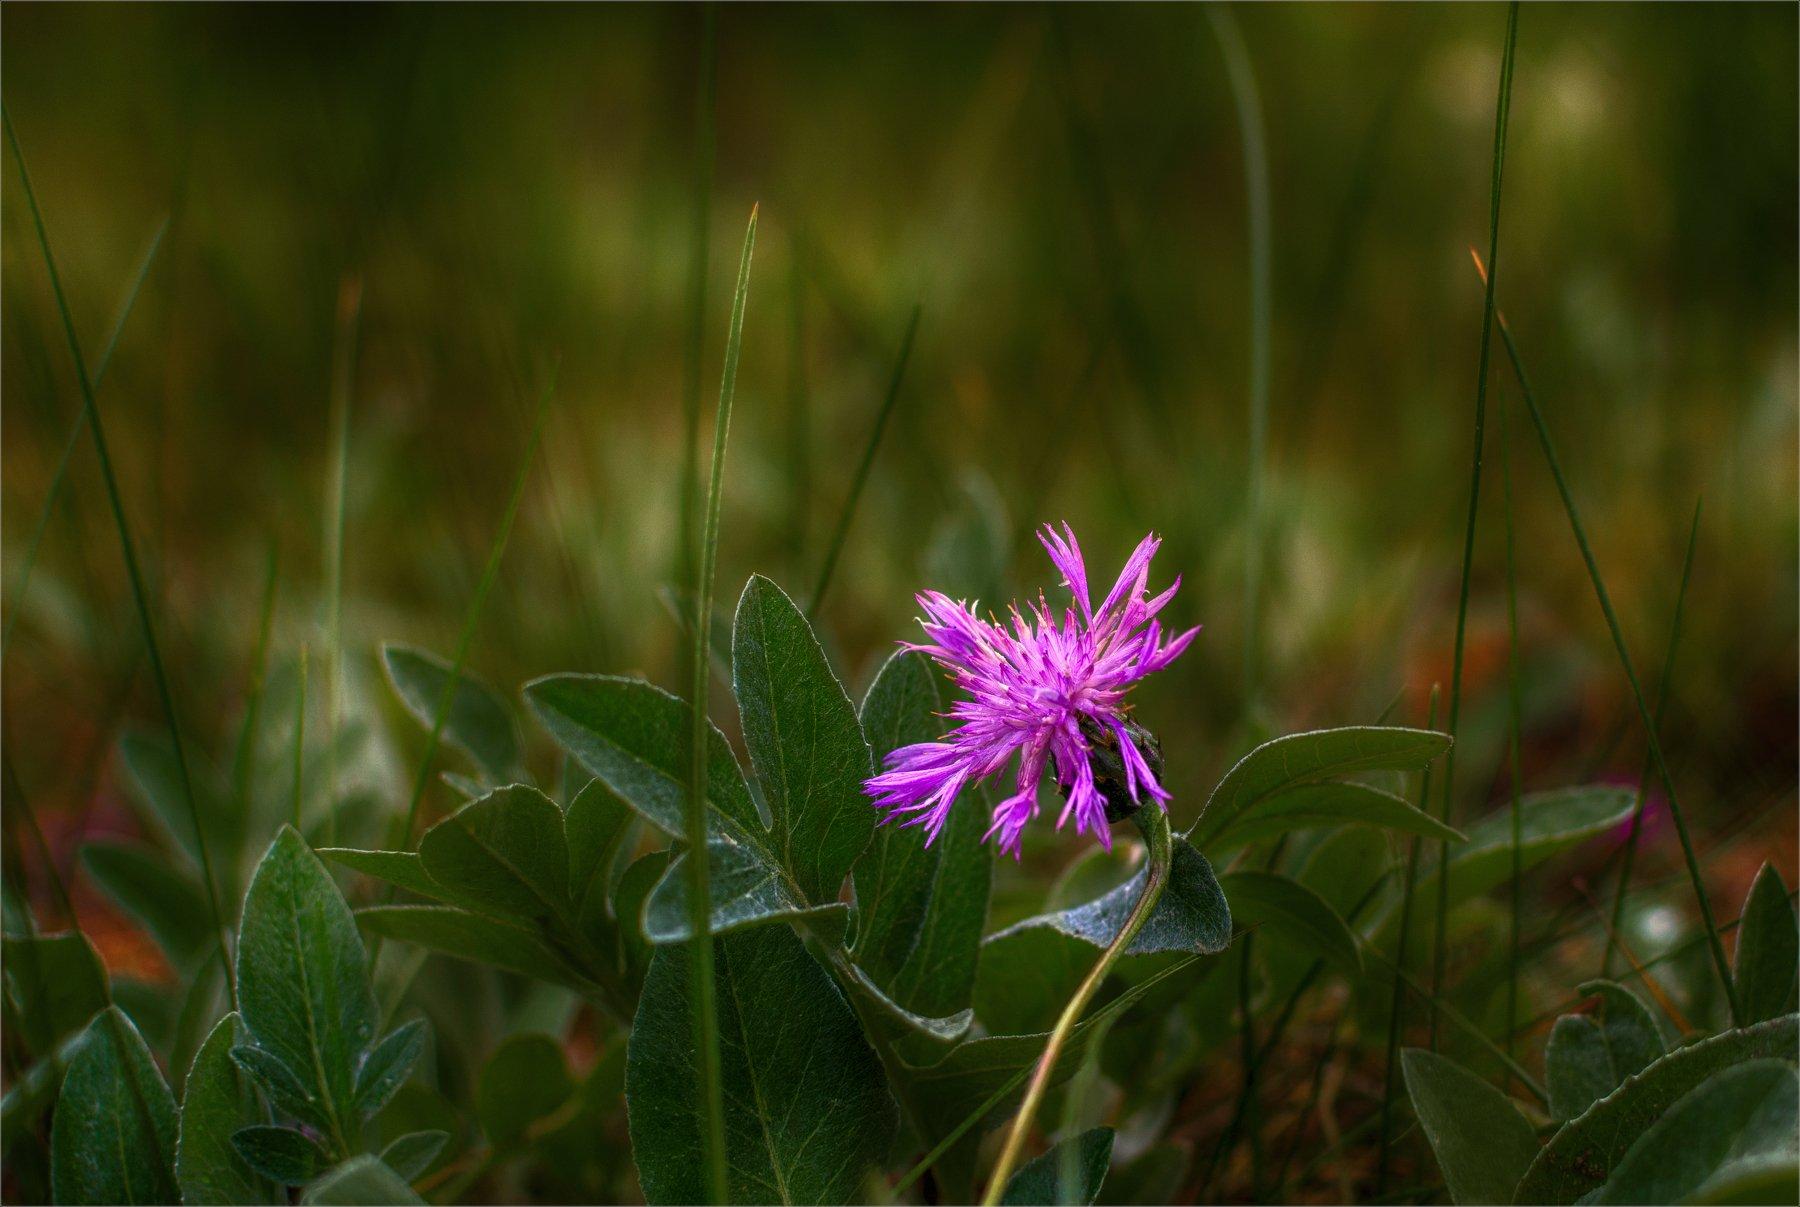 nature, природа,  растение,  солнечный свет, цветы, цветок,  цвести,  весна, красота, лето, трава, василек, Михаил MSH